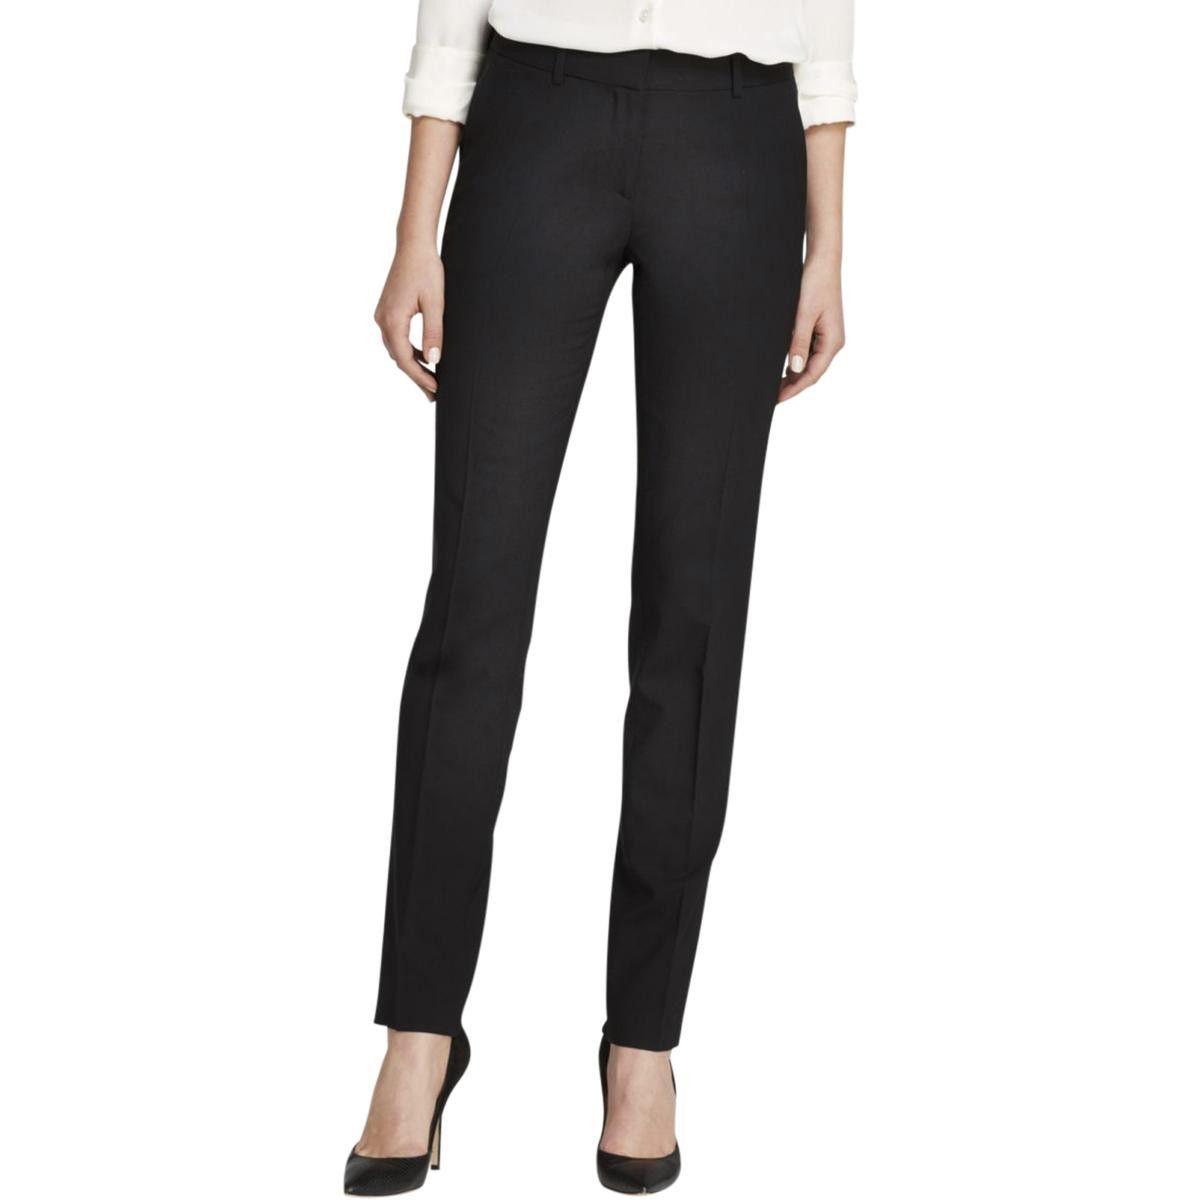 Theory Womens Wool Solid Dress Pants